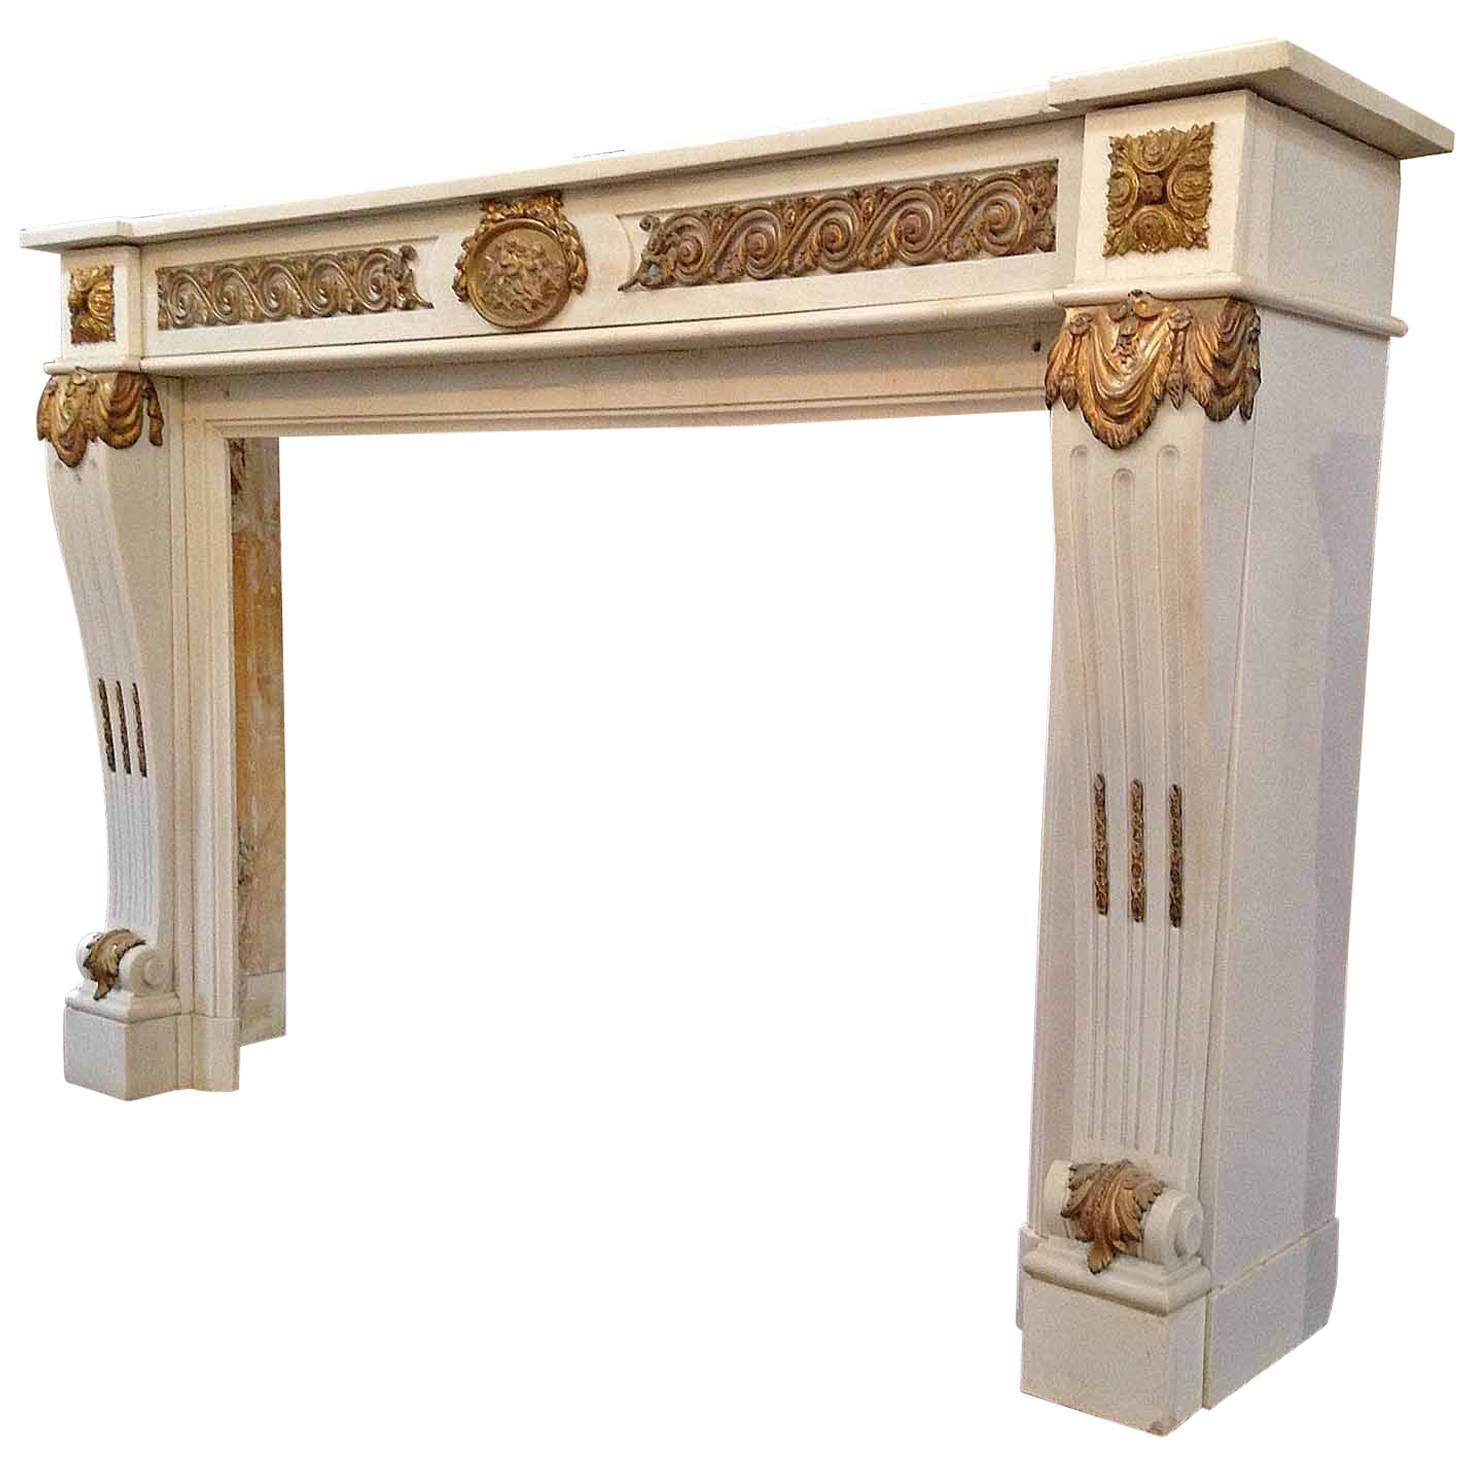 French carrera marble mantel for sale at 1stdibs - Italian garden design ideas to make exquisite roman era garden ...